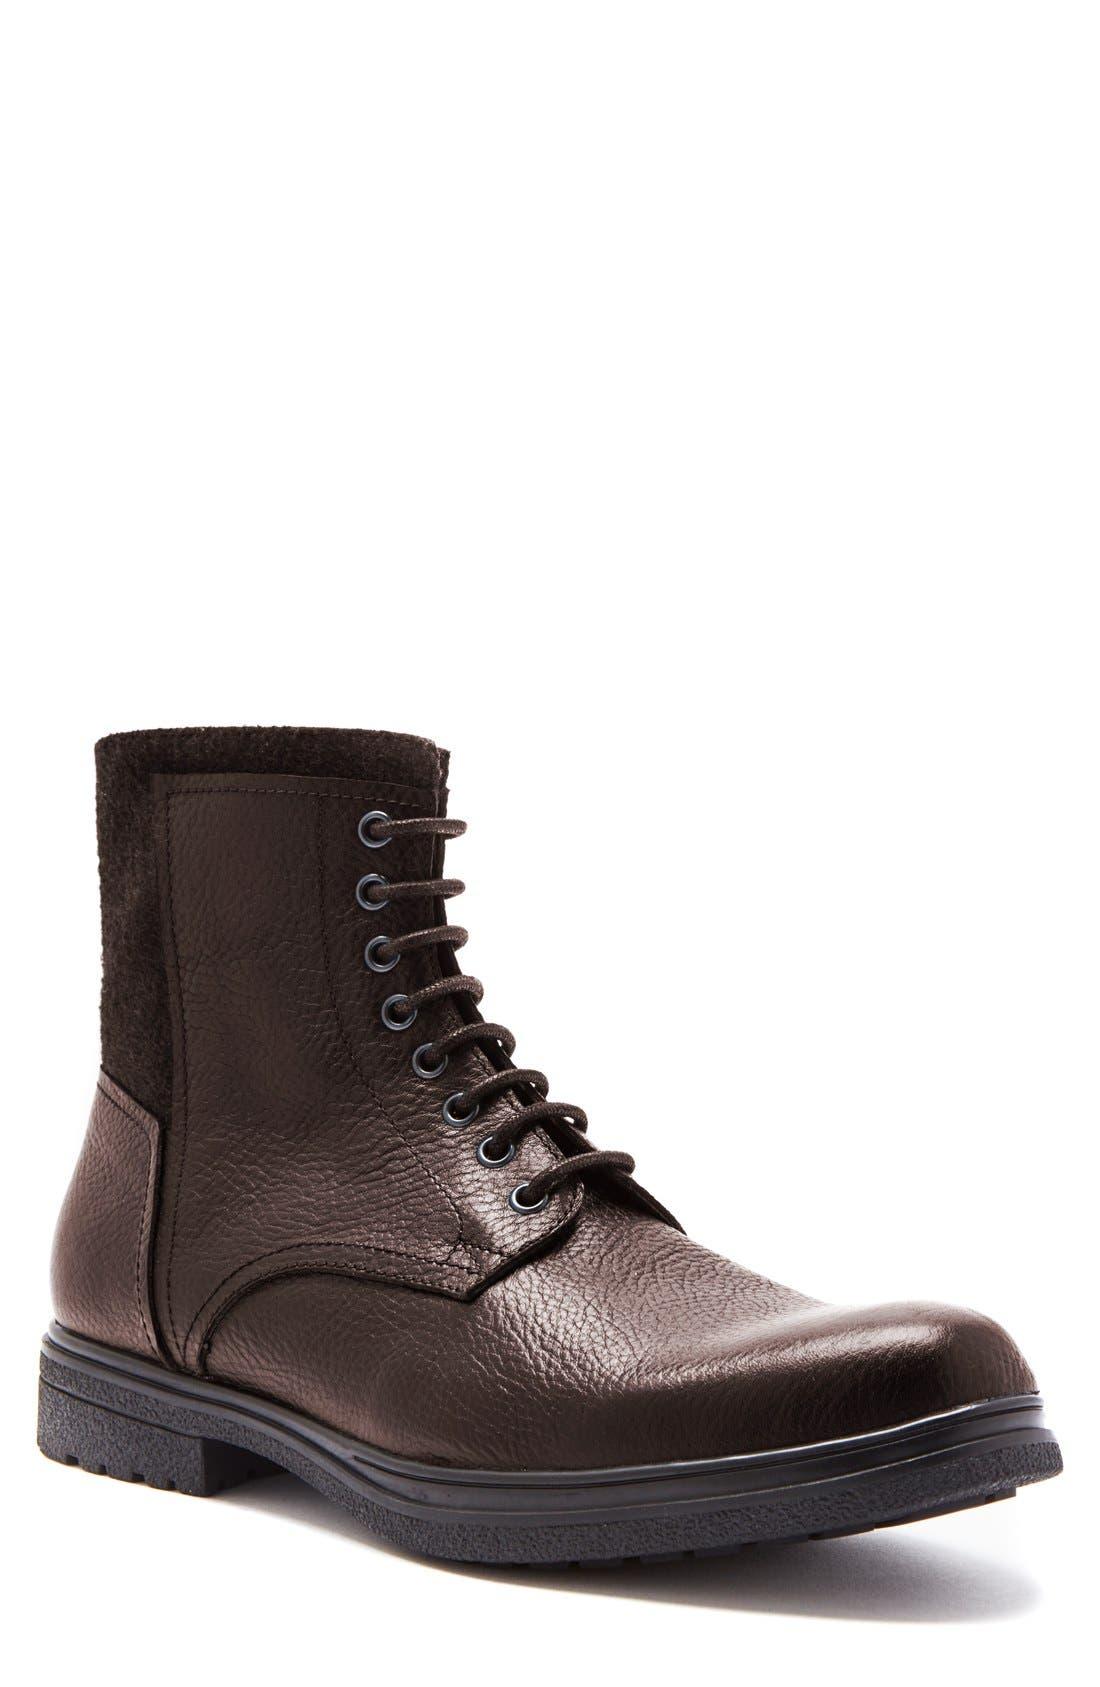 'Backoff' Waterproof Plain Toe Boot,                         Main,                         color, 200